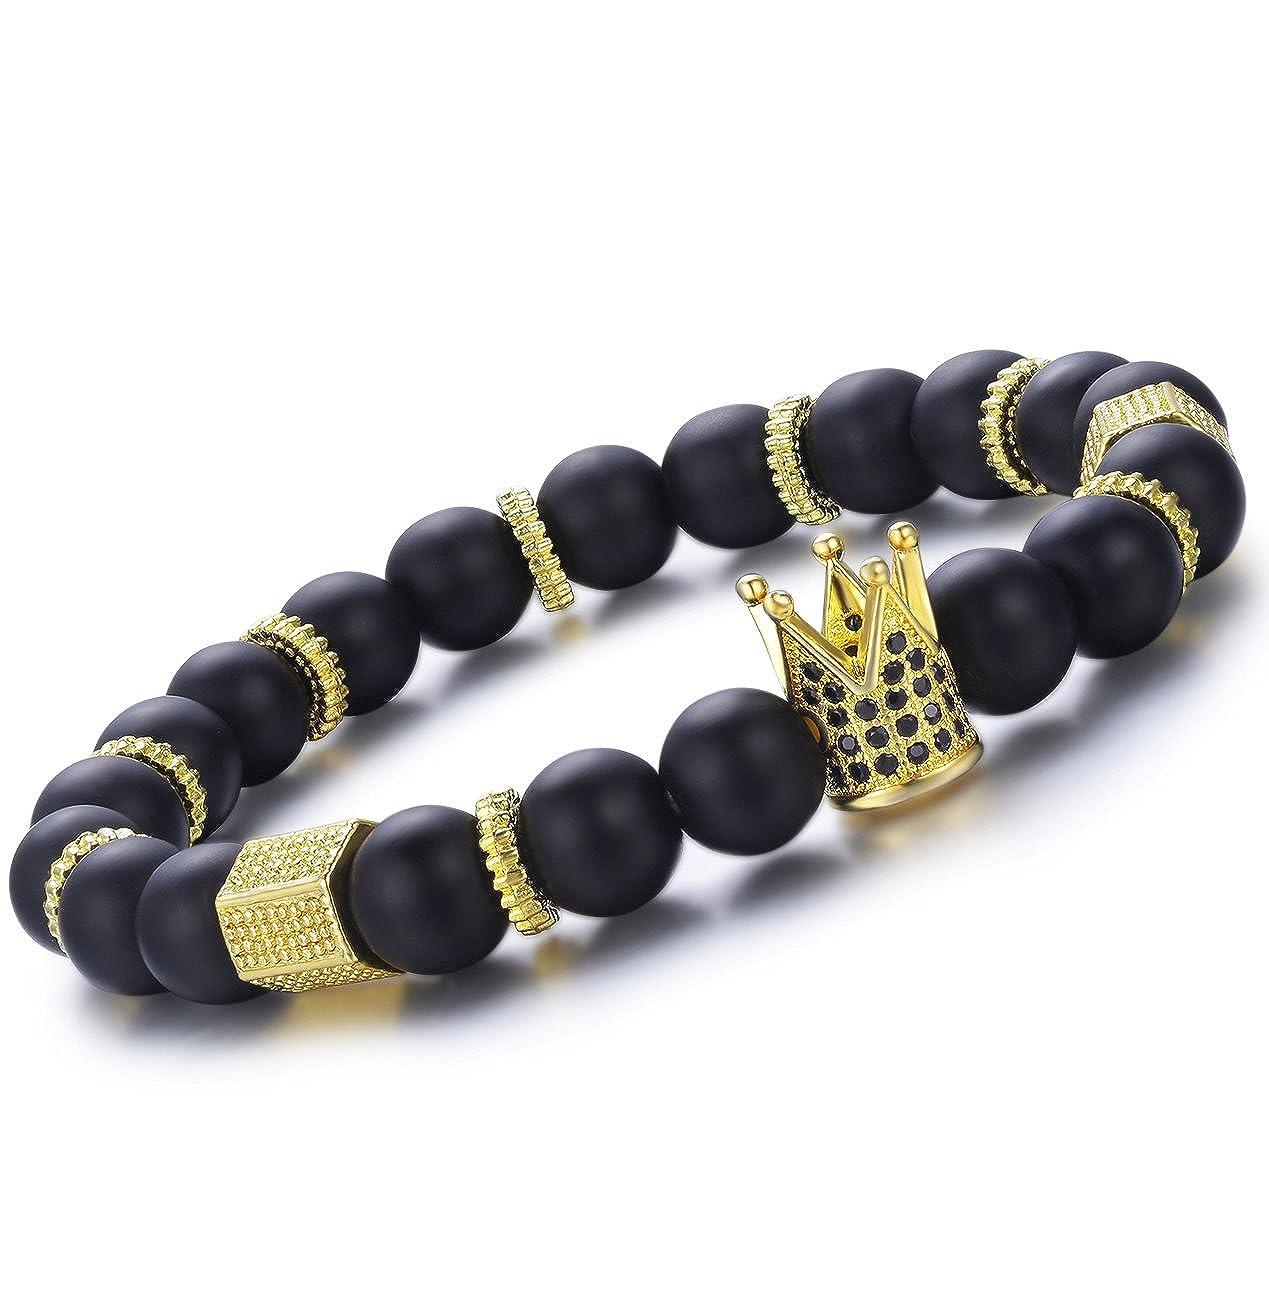 fb49ddae3f Lylymimi Bead Bracelet For Men Crown King Bracelets Black Matte Onyx Stone  Gold Tone Jewelry